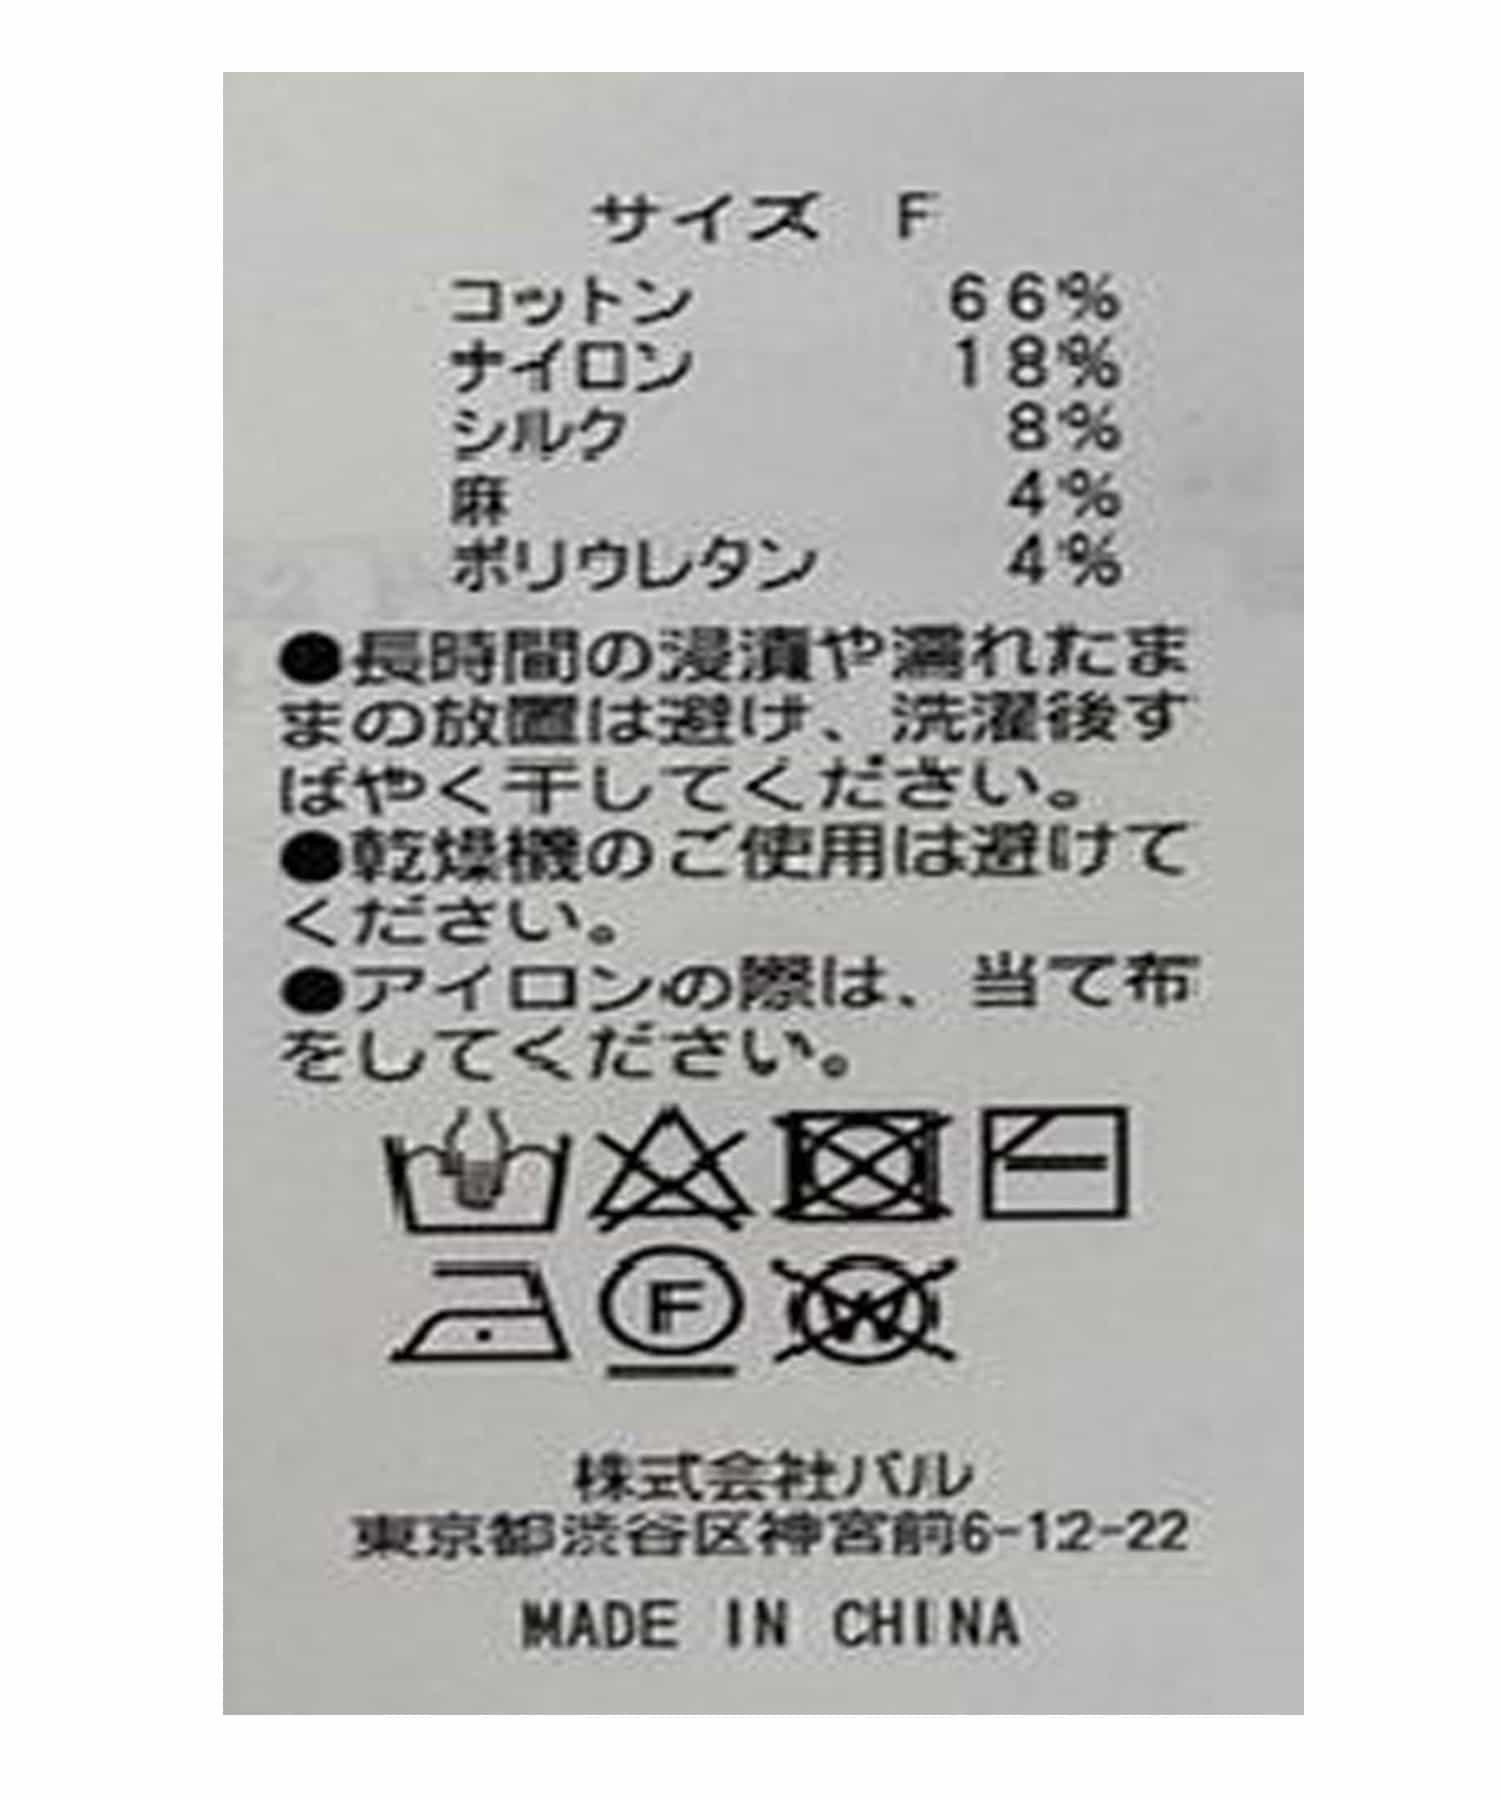 OUTLET premium(アウトレット プレミアム) 【手洗い可】シルク混クルーネックワイドニット